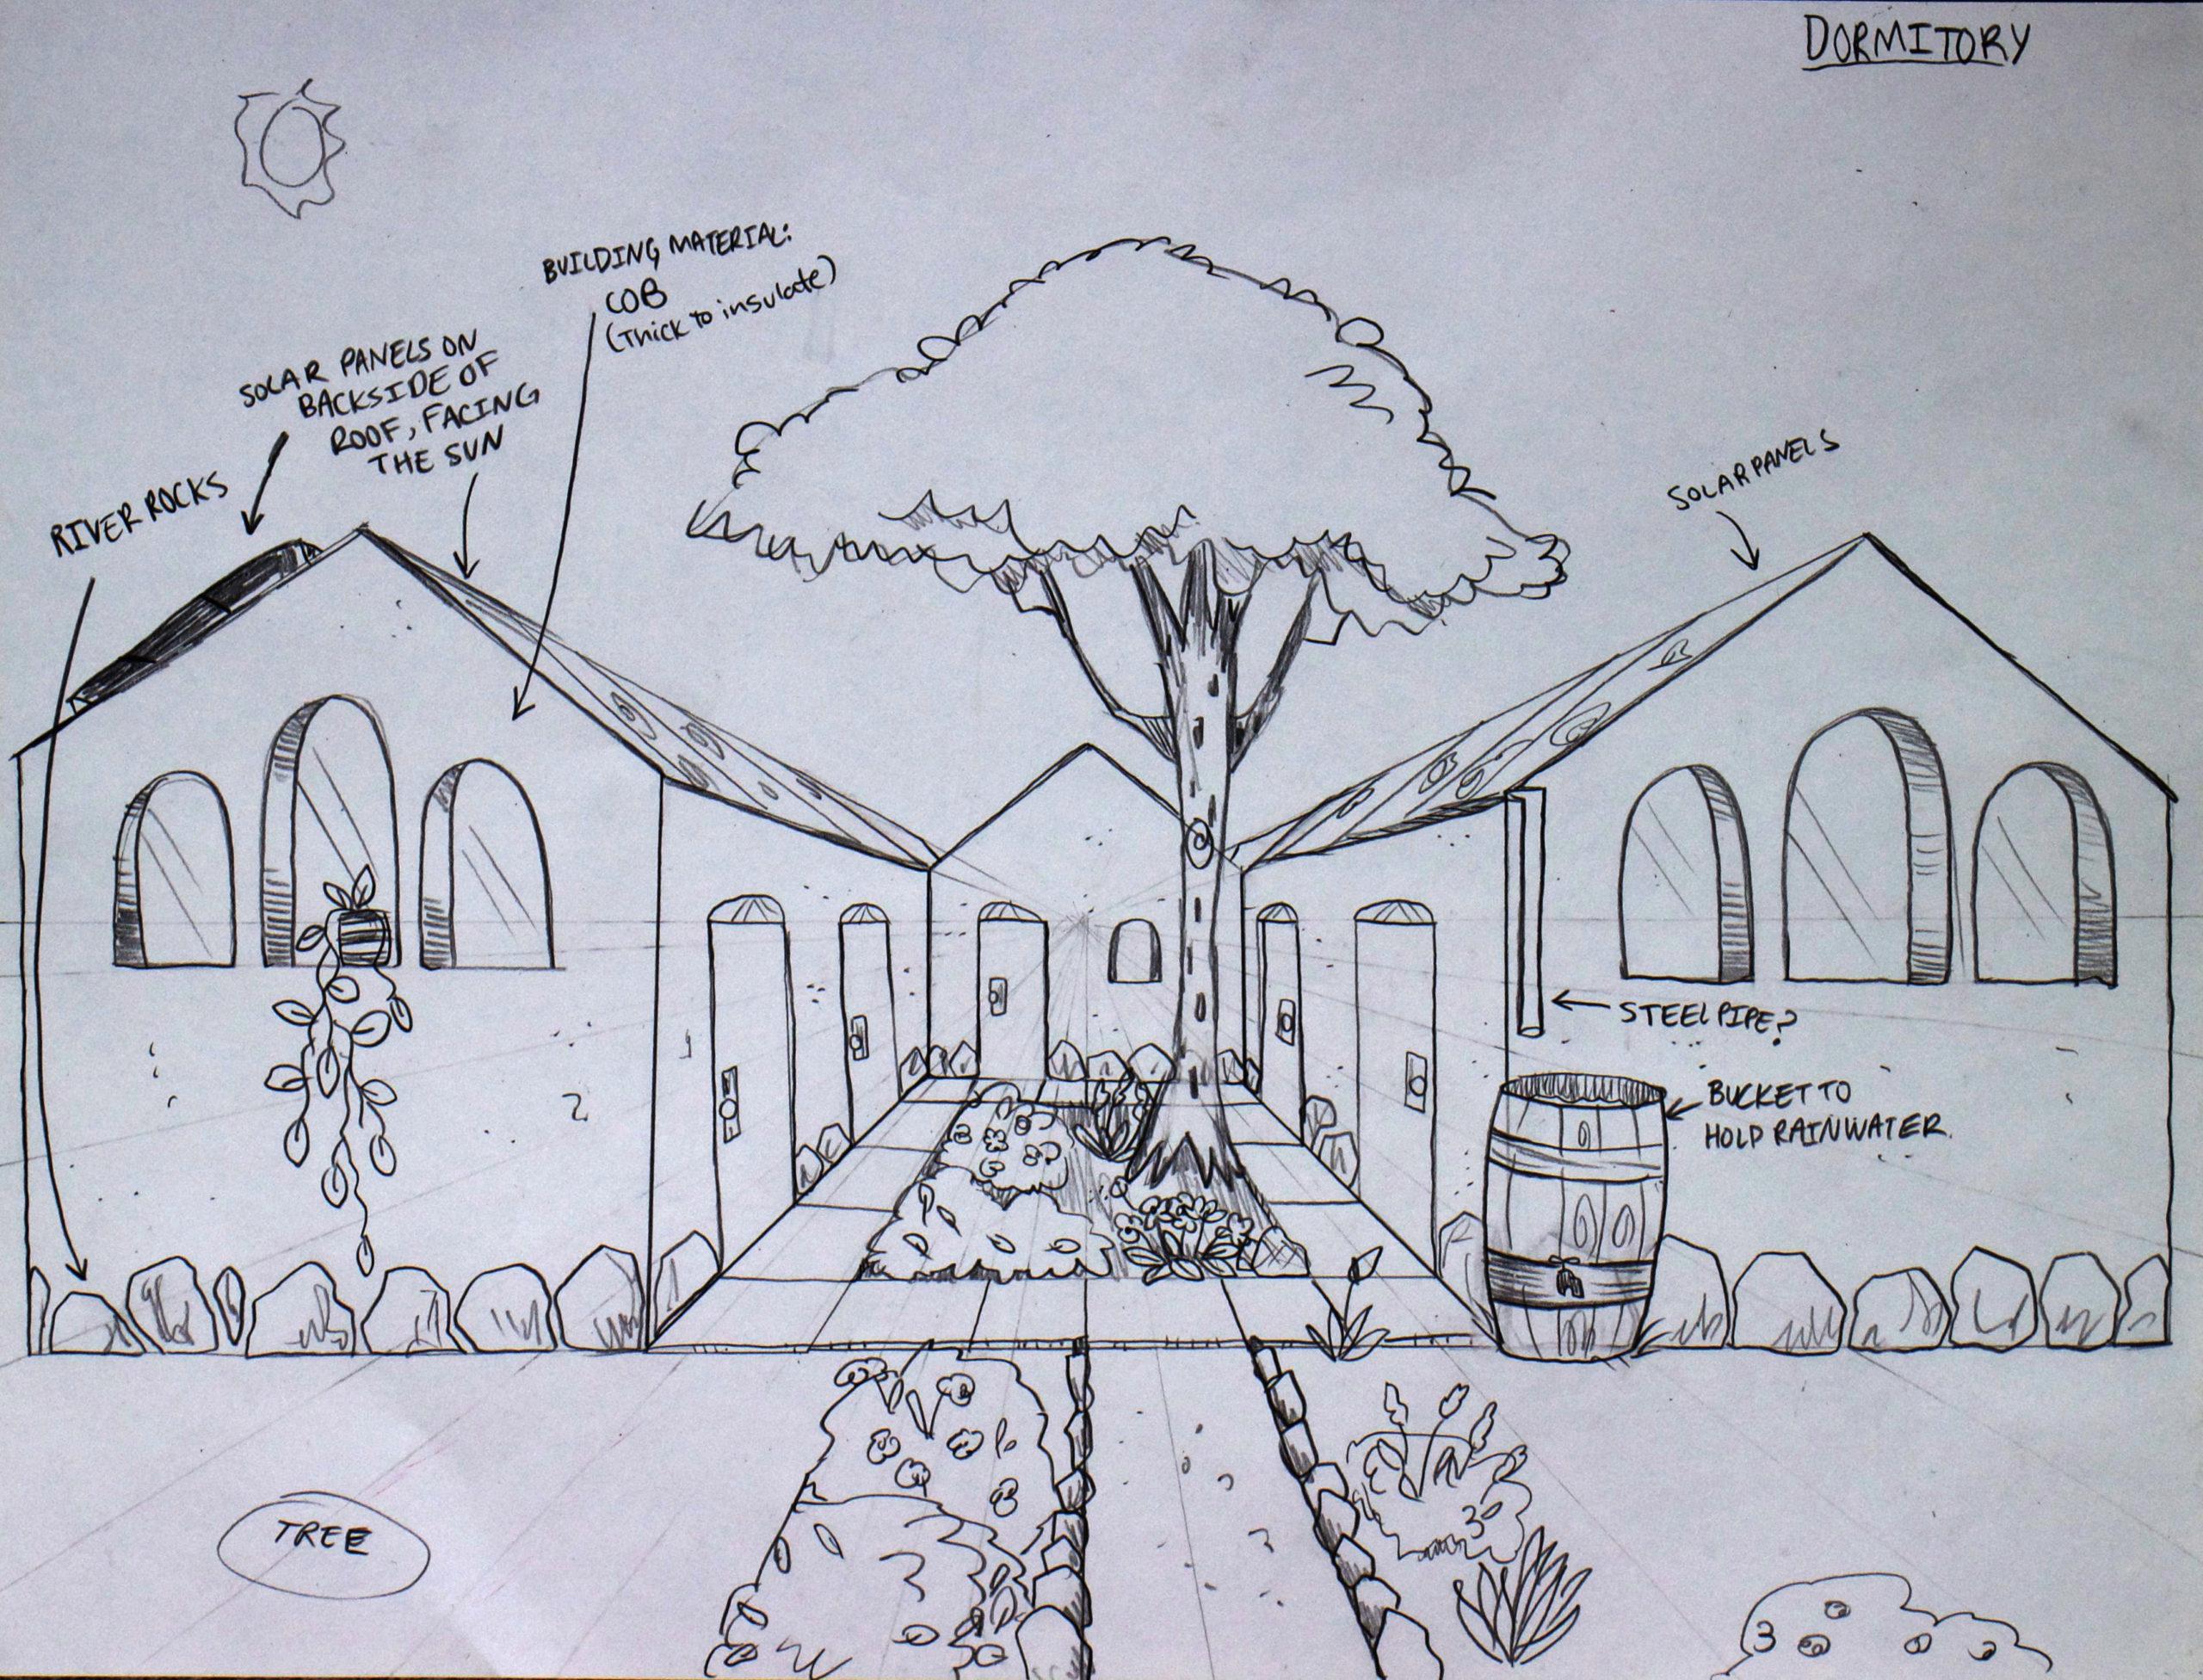 9 Dormitory Enlarged Plan